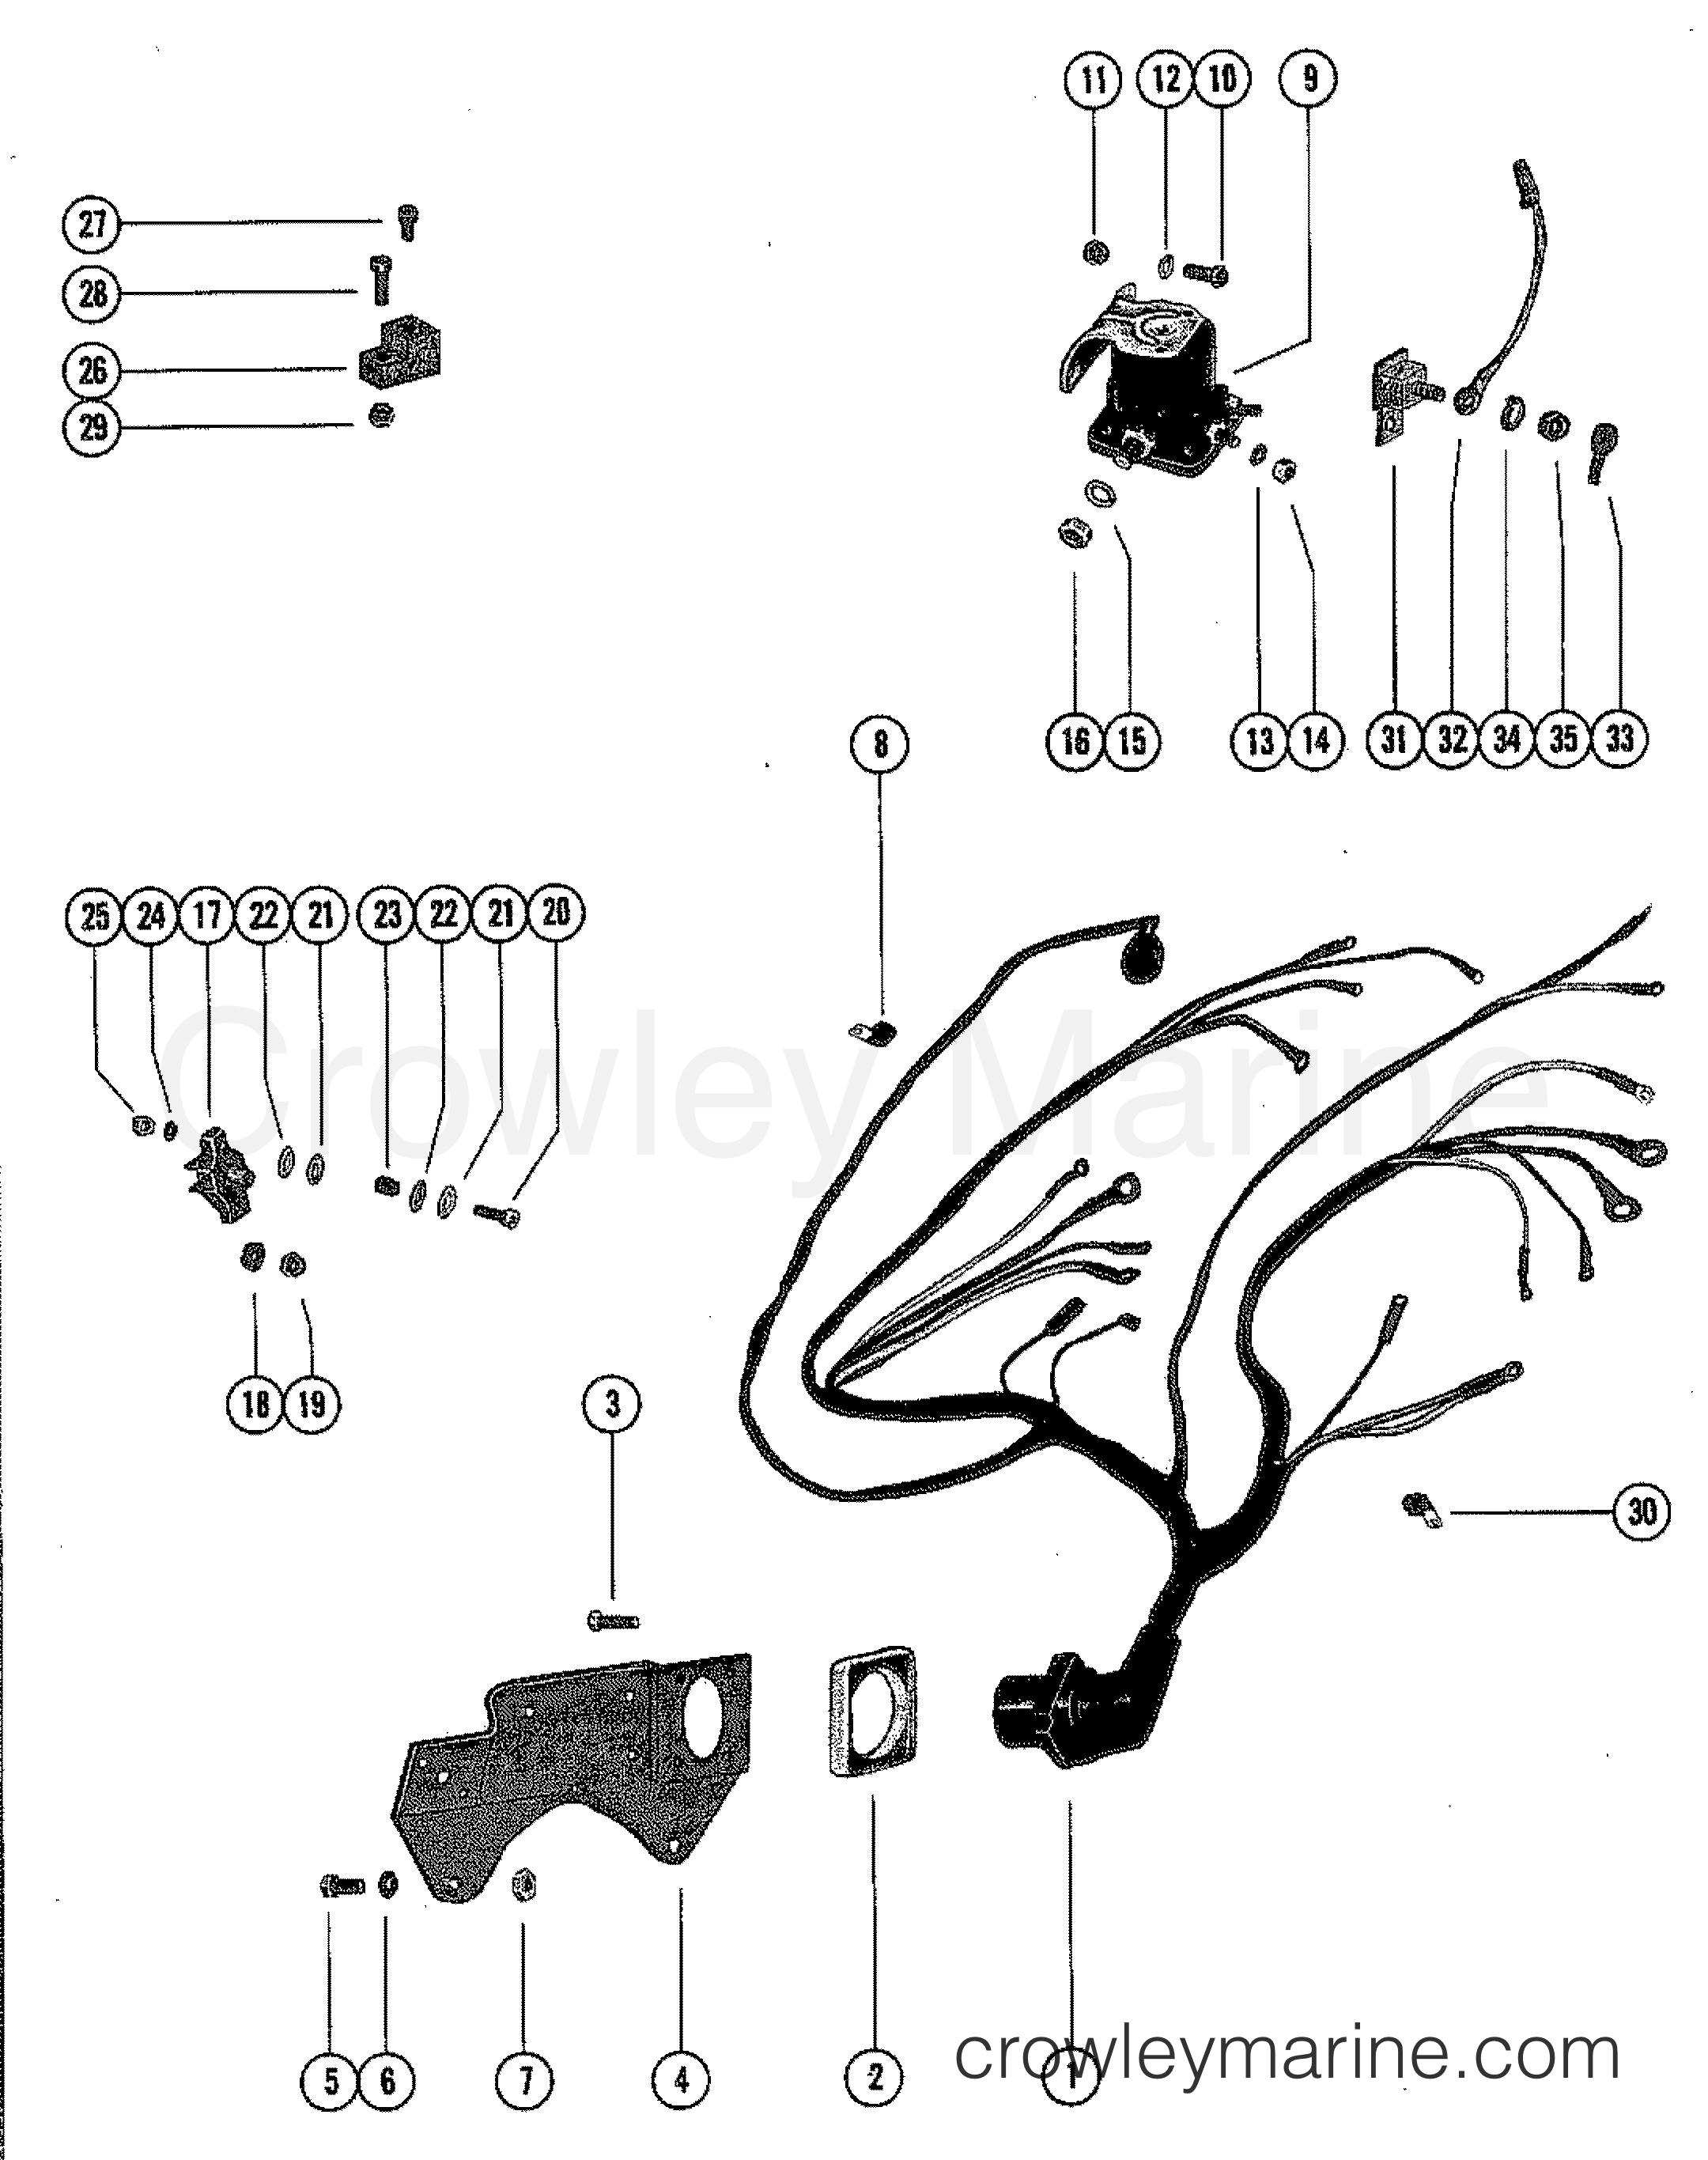 1982 mercury outboard wiring diagram